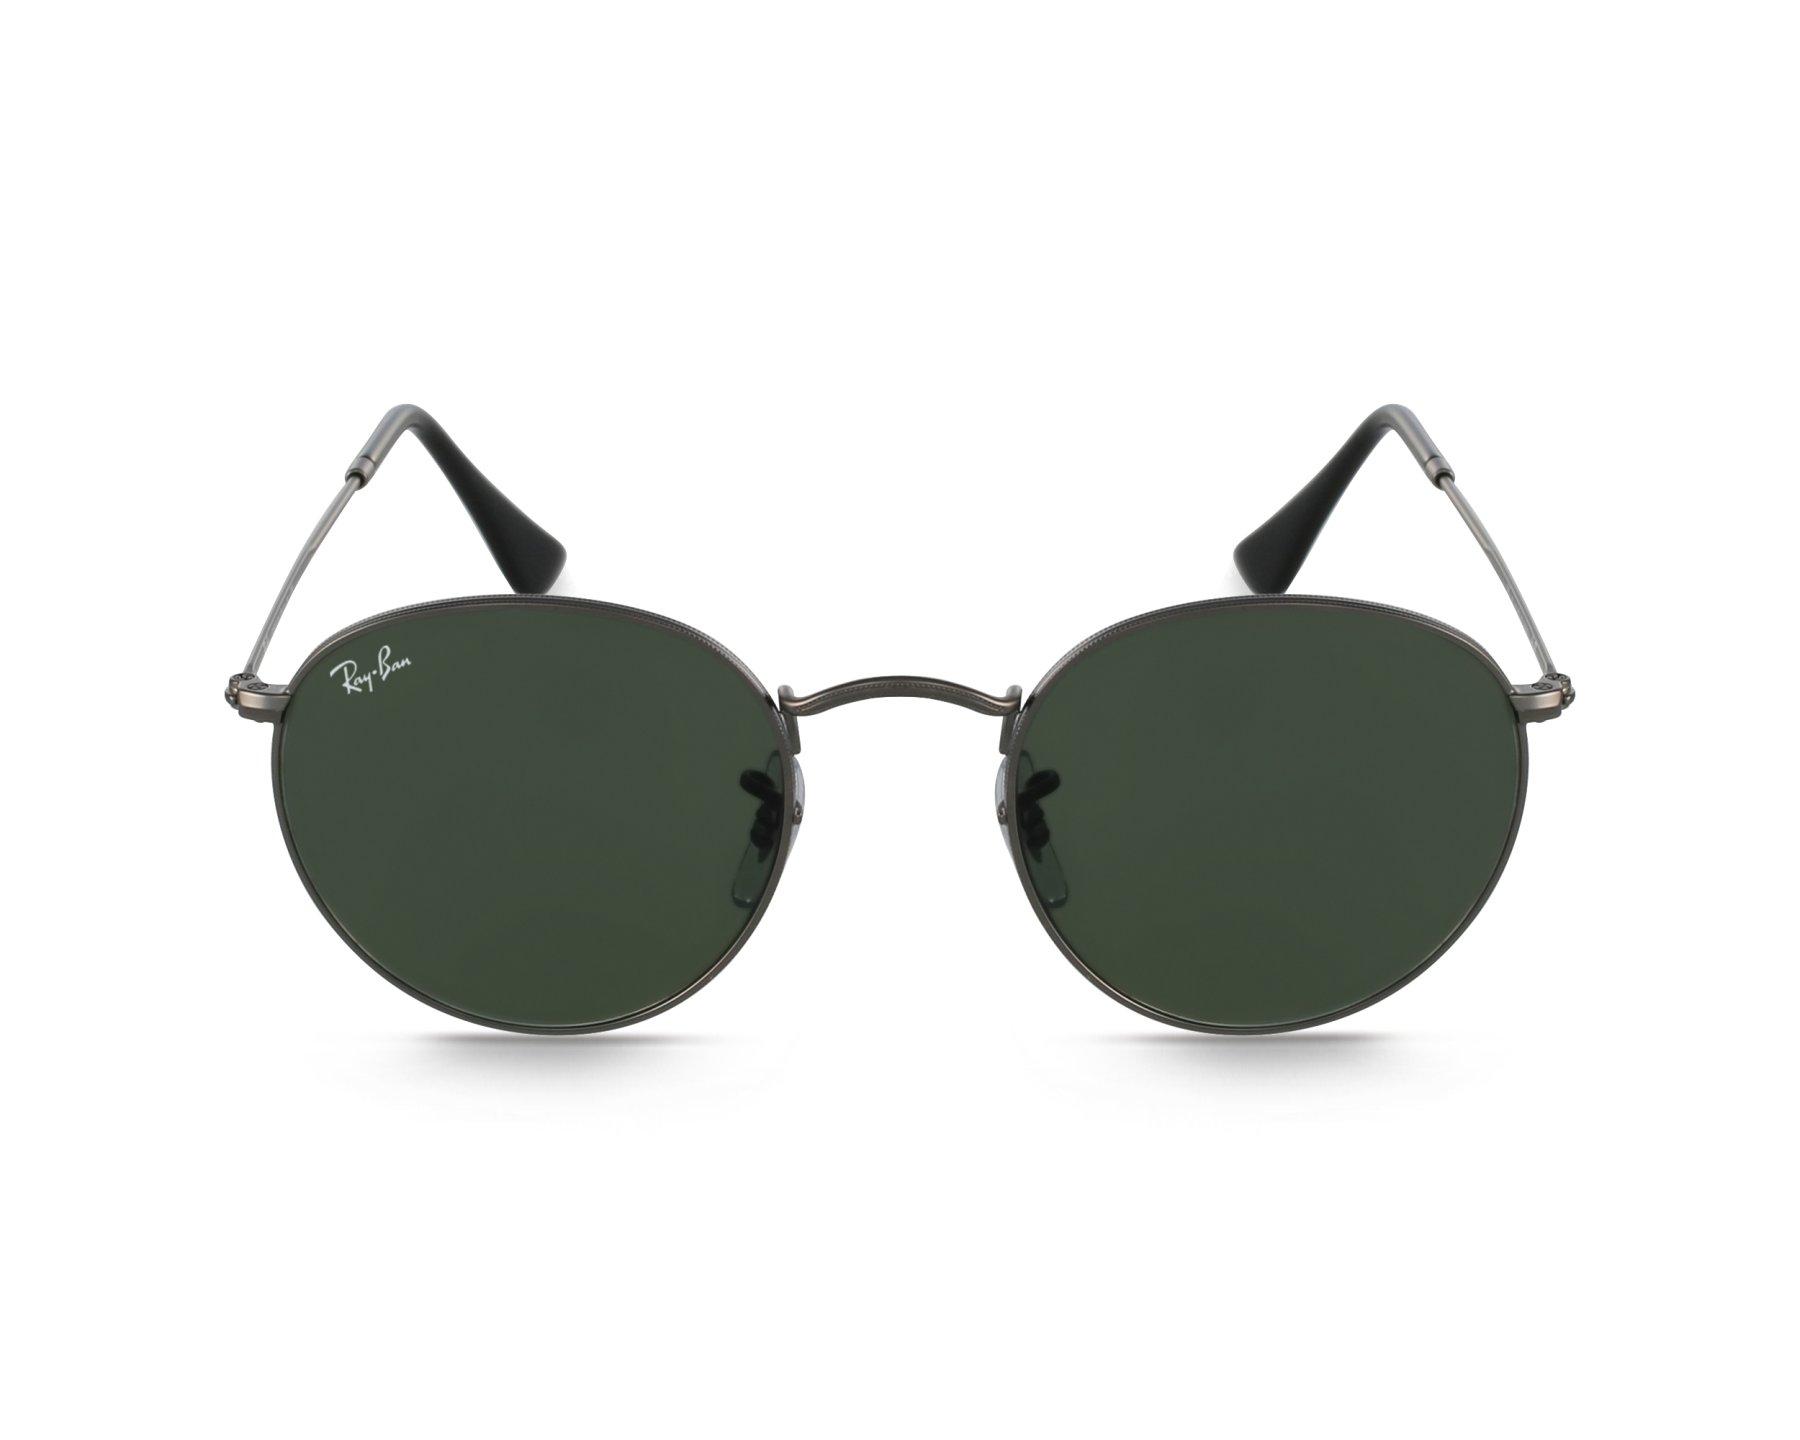 650ea57b89 Sunglasses Ray-Ban RB-3447 029 50-21 Grey profile view